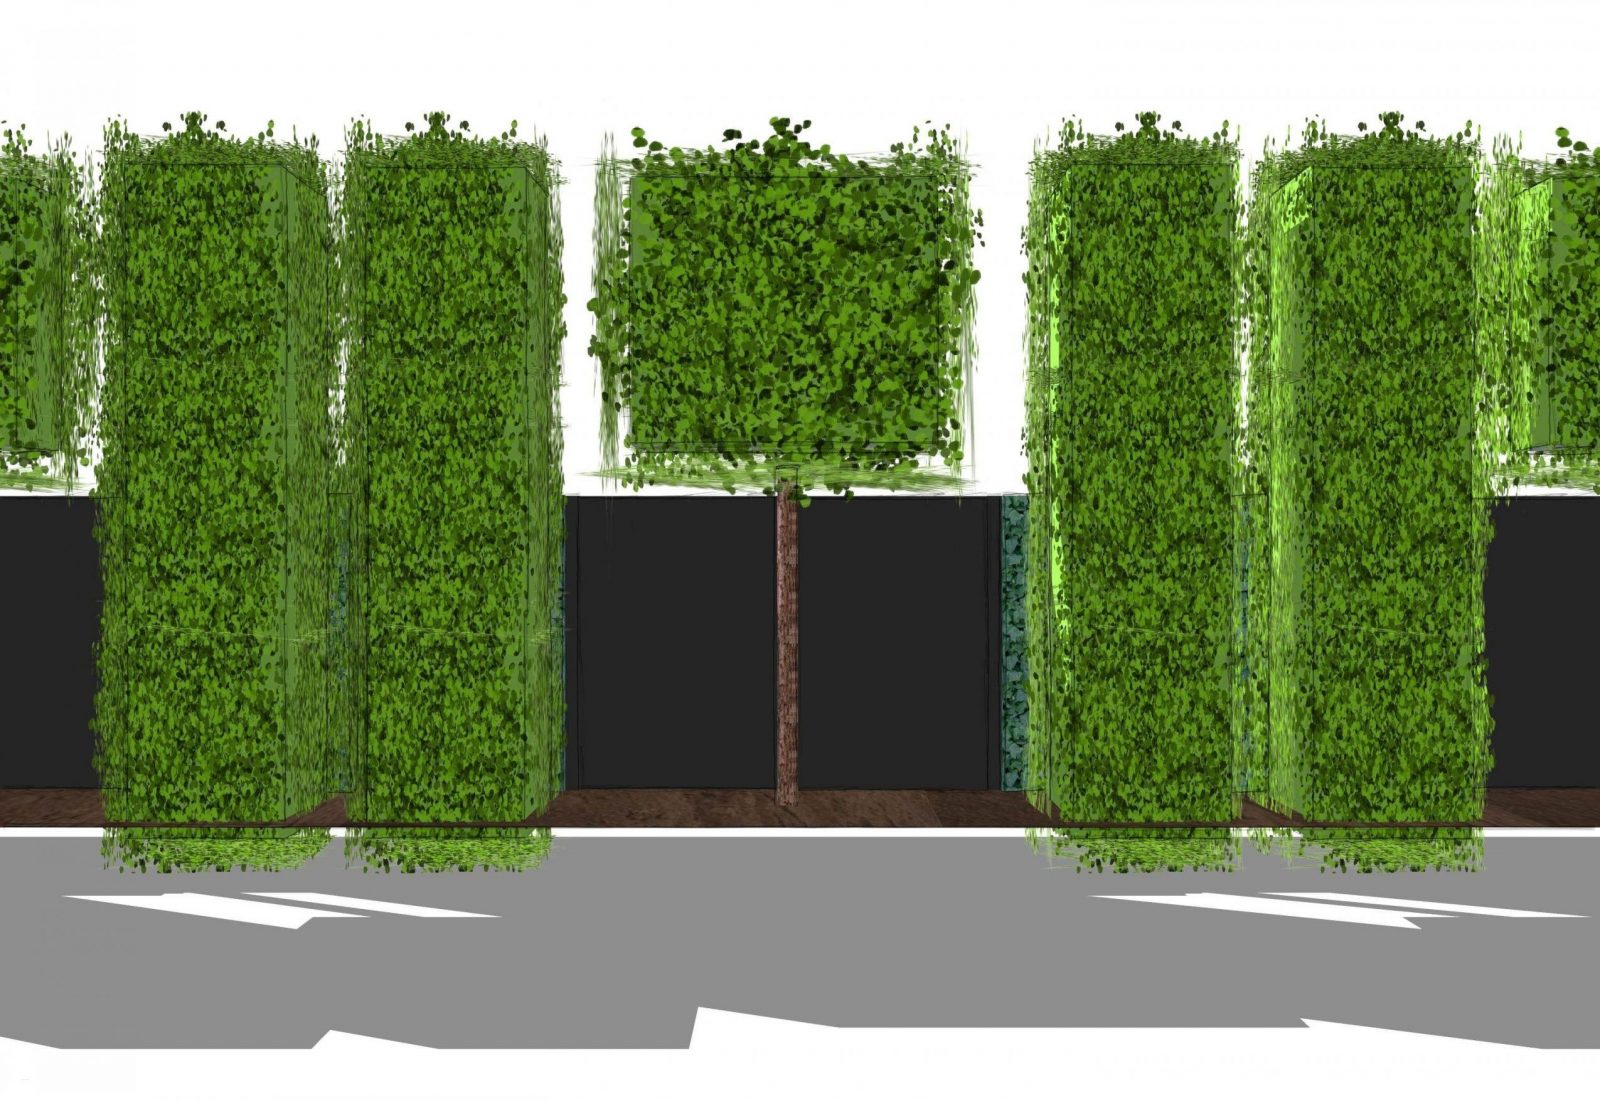 sichtschutz efeu am laufenden meter haus design ideen. Black Bedroom Furniture Sets. Home Design Ideas